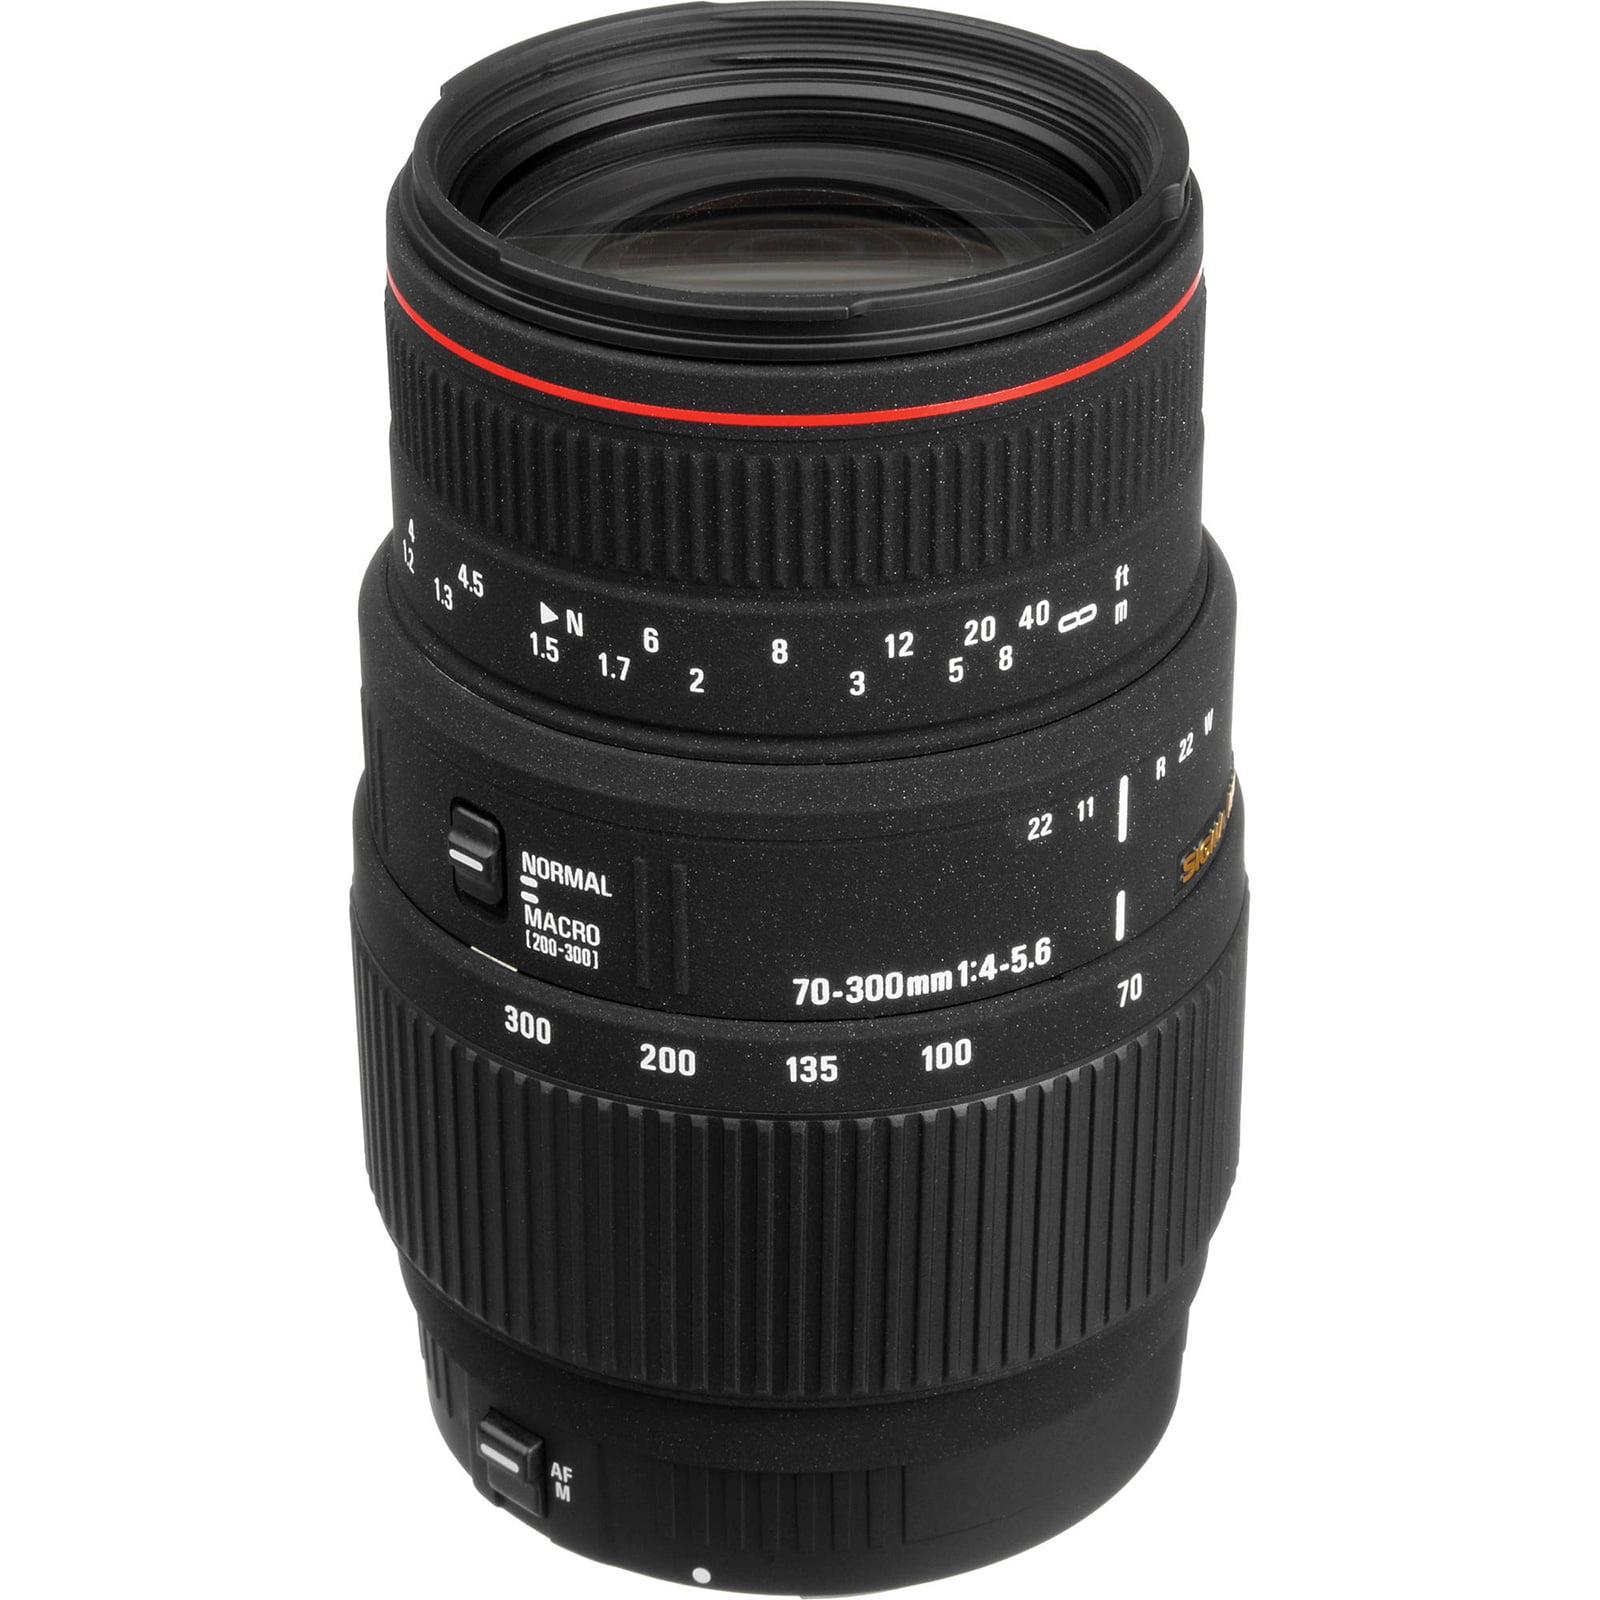 Sigma 70-300mm f/4-5.6 APO DG Macro Zoom Lens (for Canon EOS Cameras)